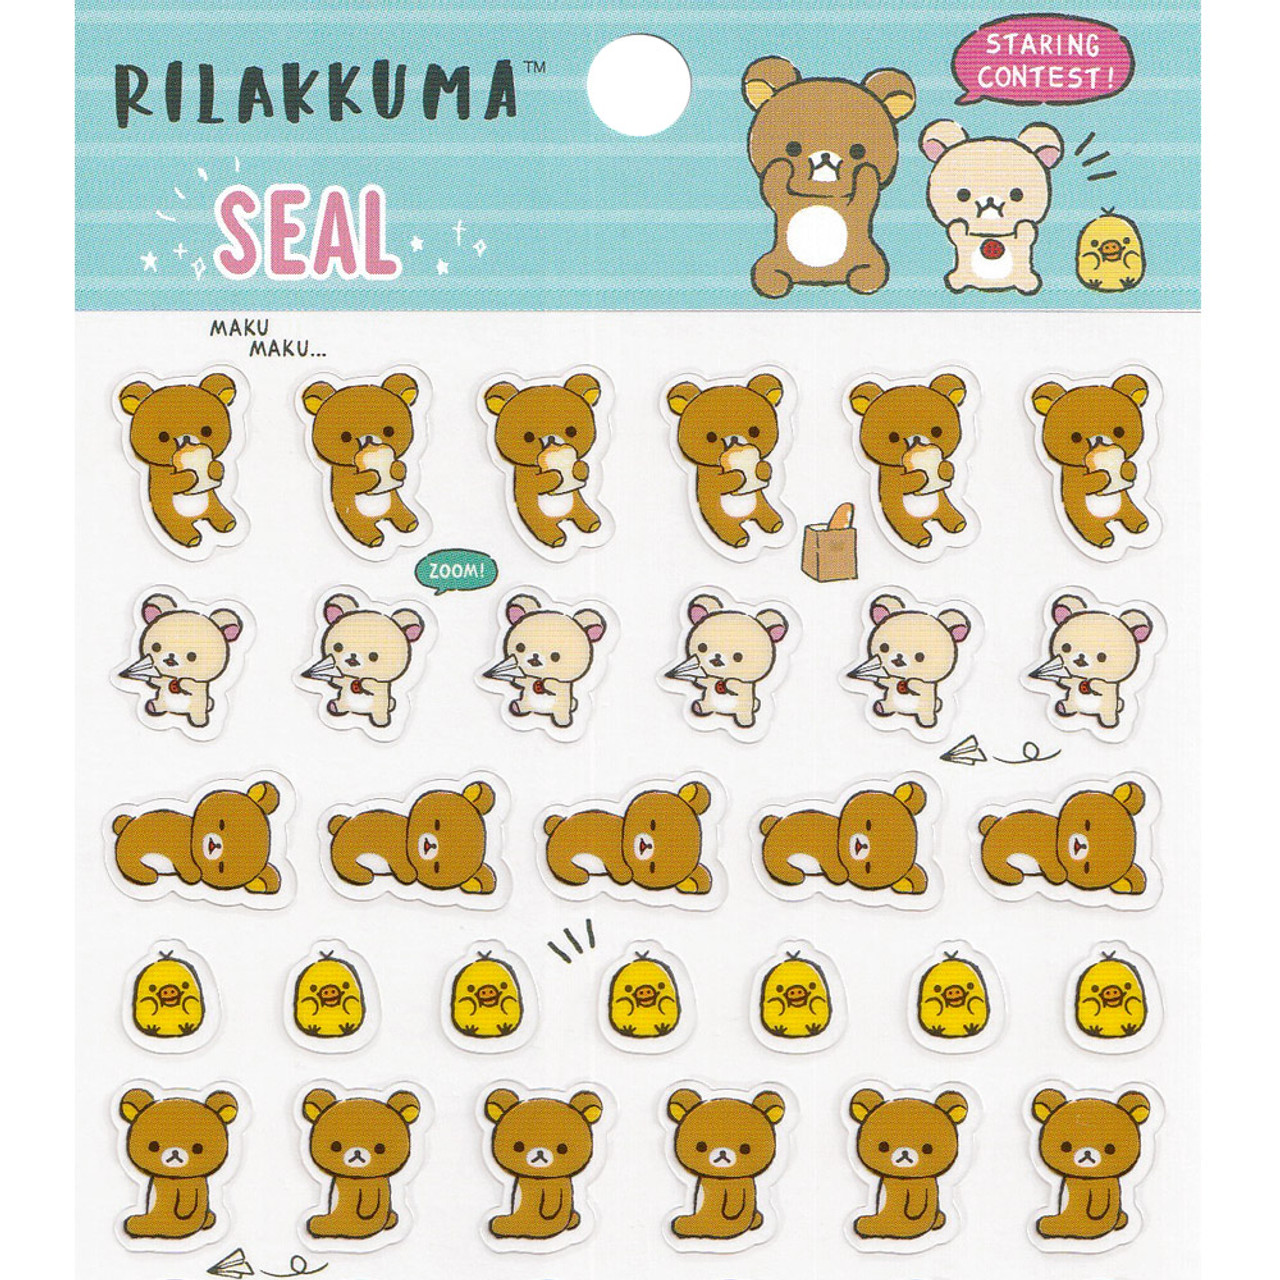 Rilakkuma Bear Staring Contest Sticker SE39103 ( Top Part Of View )